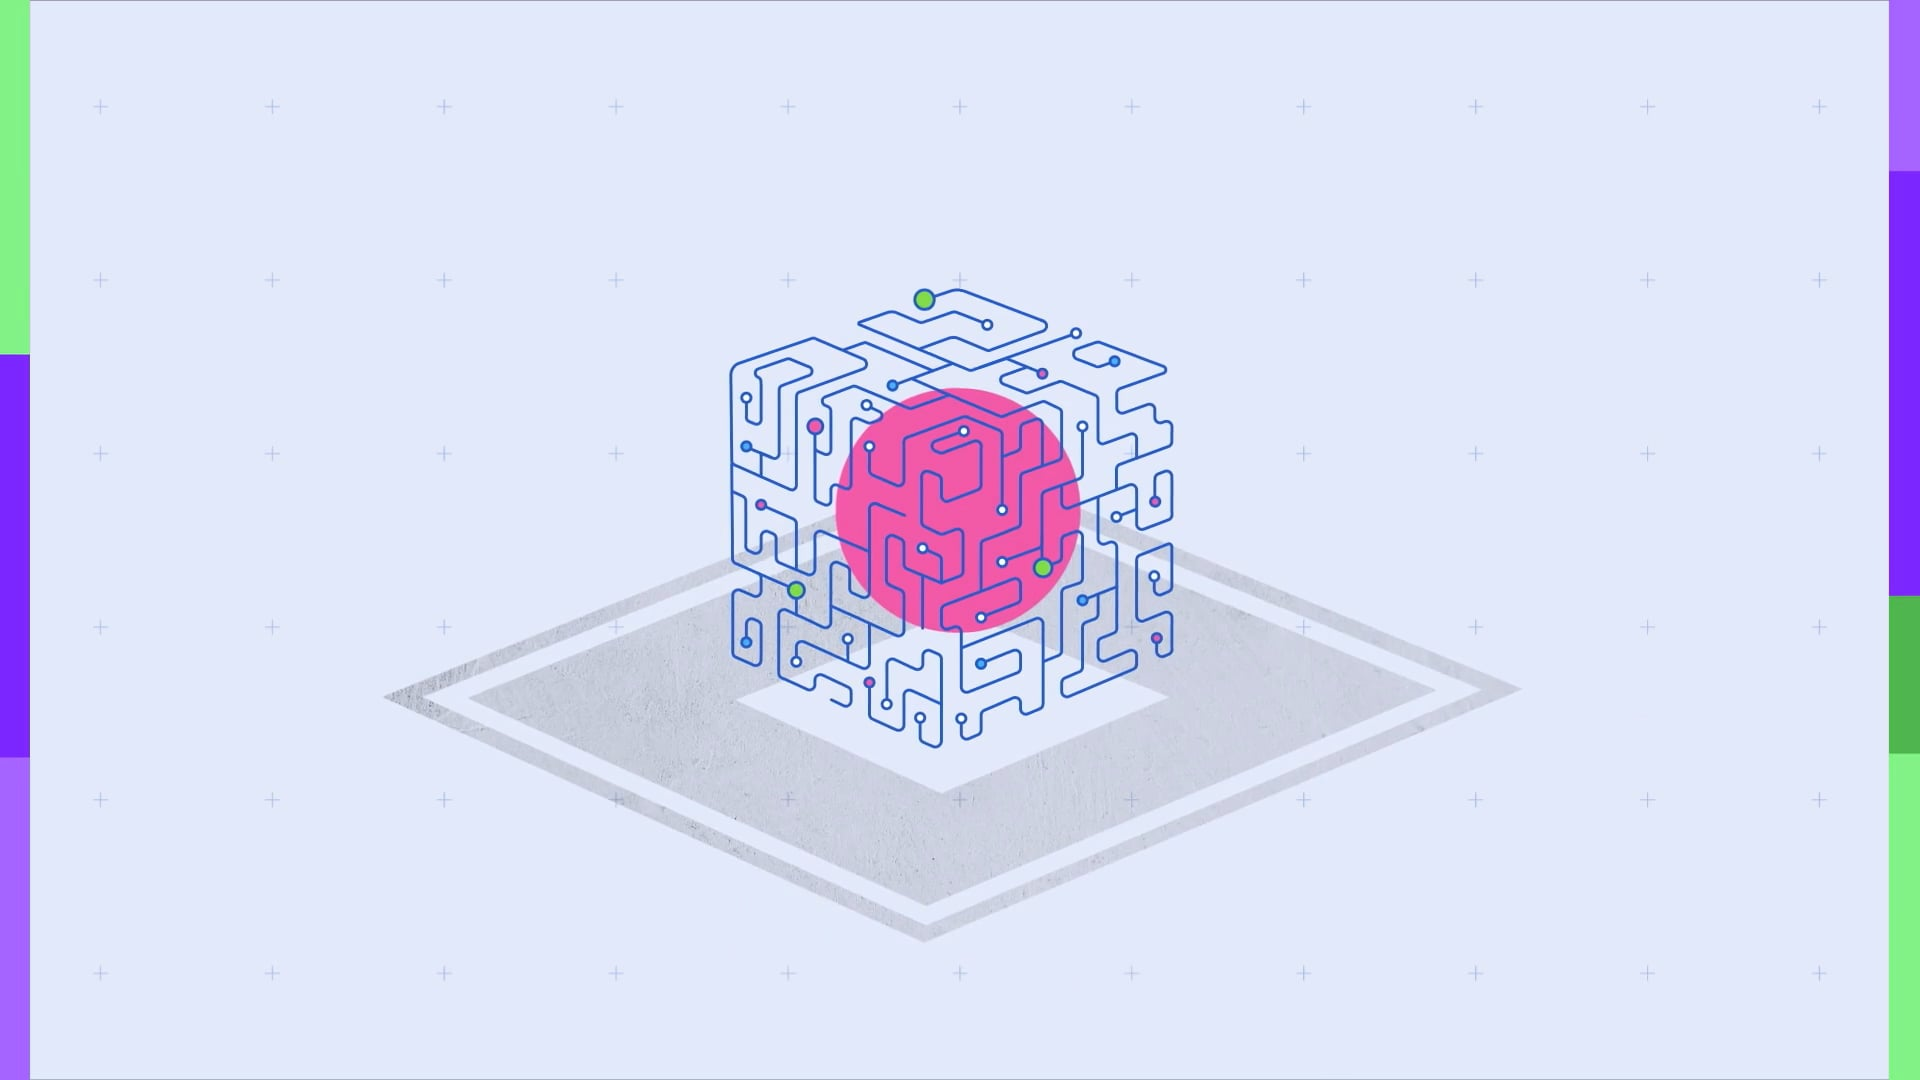 IBM - 8min calculer l'incalculable (épisode 3)